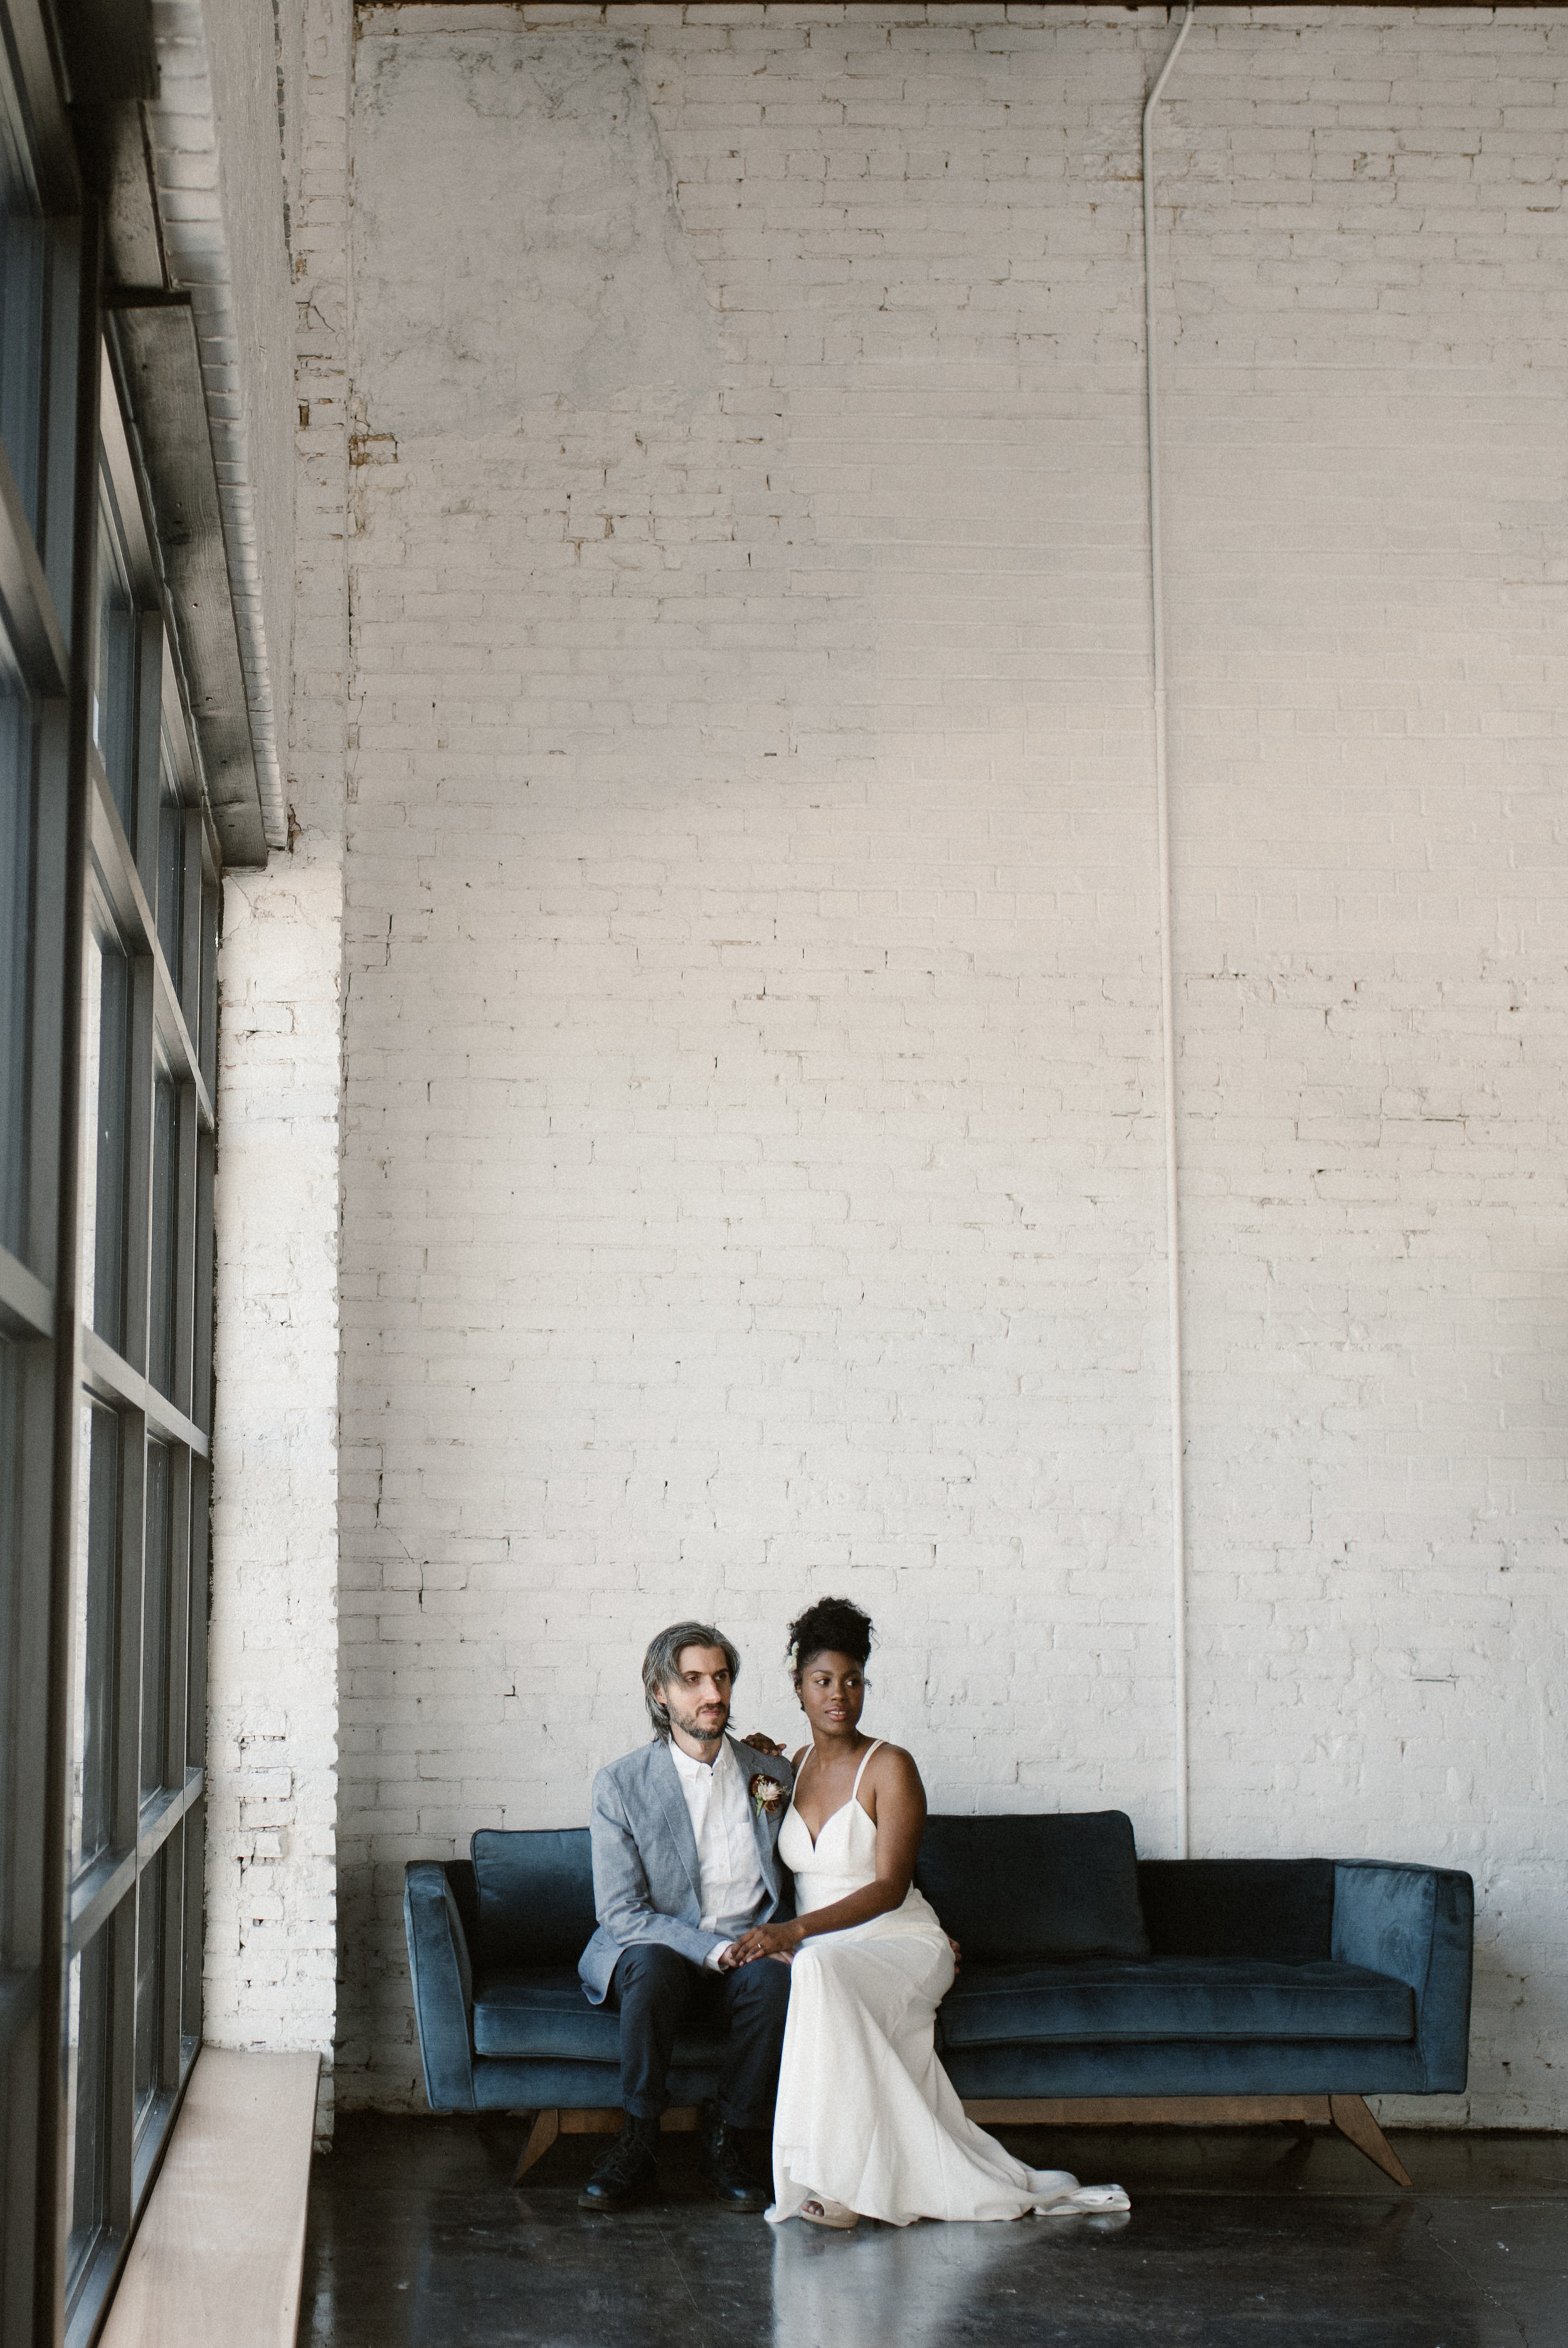 haus-820-minimal-editorial-wedding-styled-shoot-9.jpg